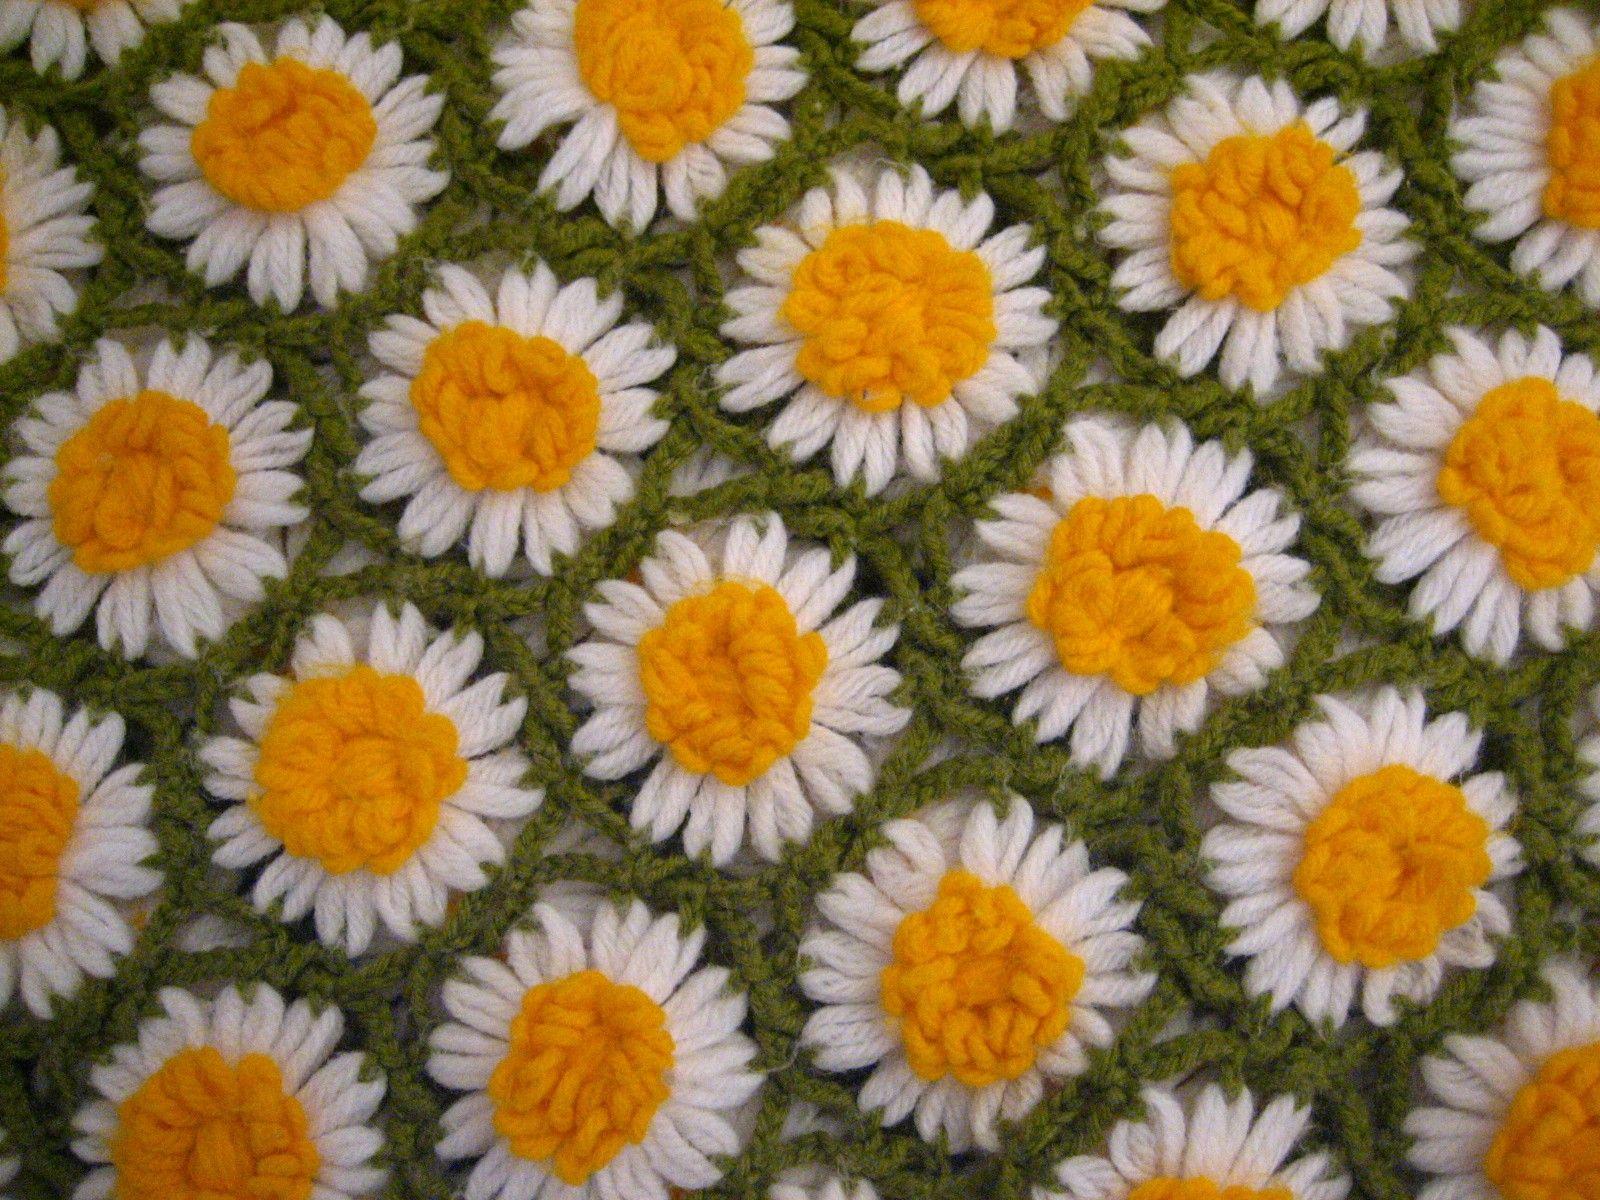 Crochetdaisyblanketg colors pinterest crochet daisy crochetdaisyblanketg sewing craftsdiy craftscrochet quilt patternquilt patternscrochet daisycrochet flowersknit izmirmasajfo Choice Image